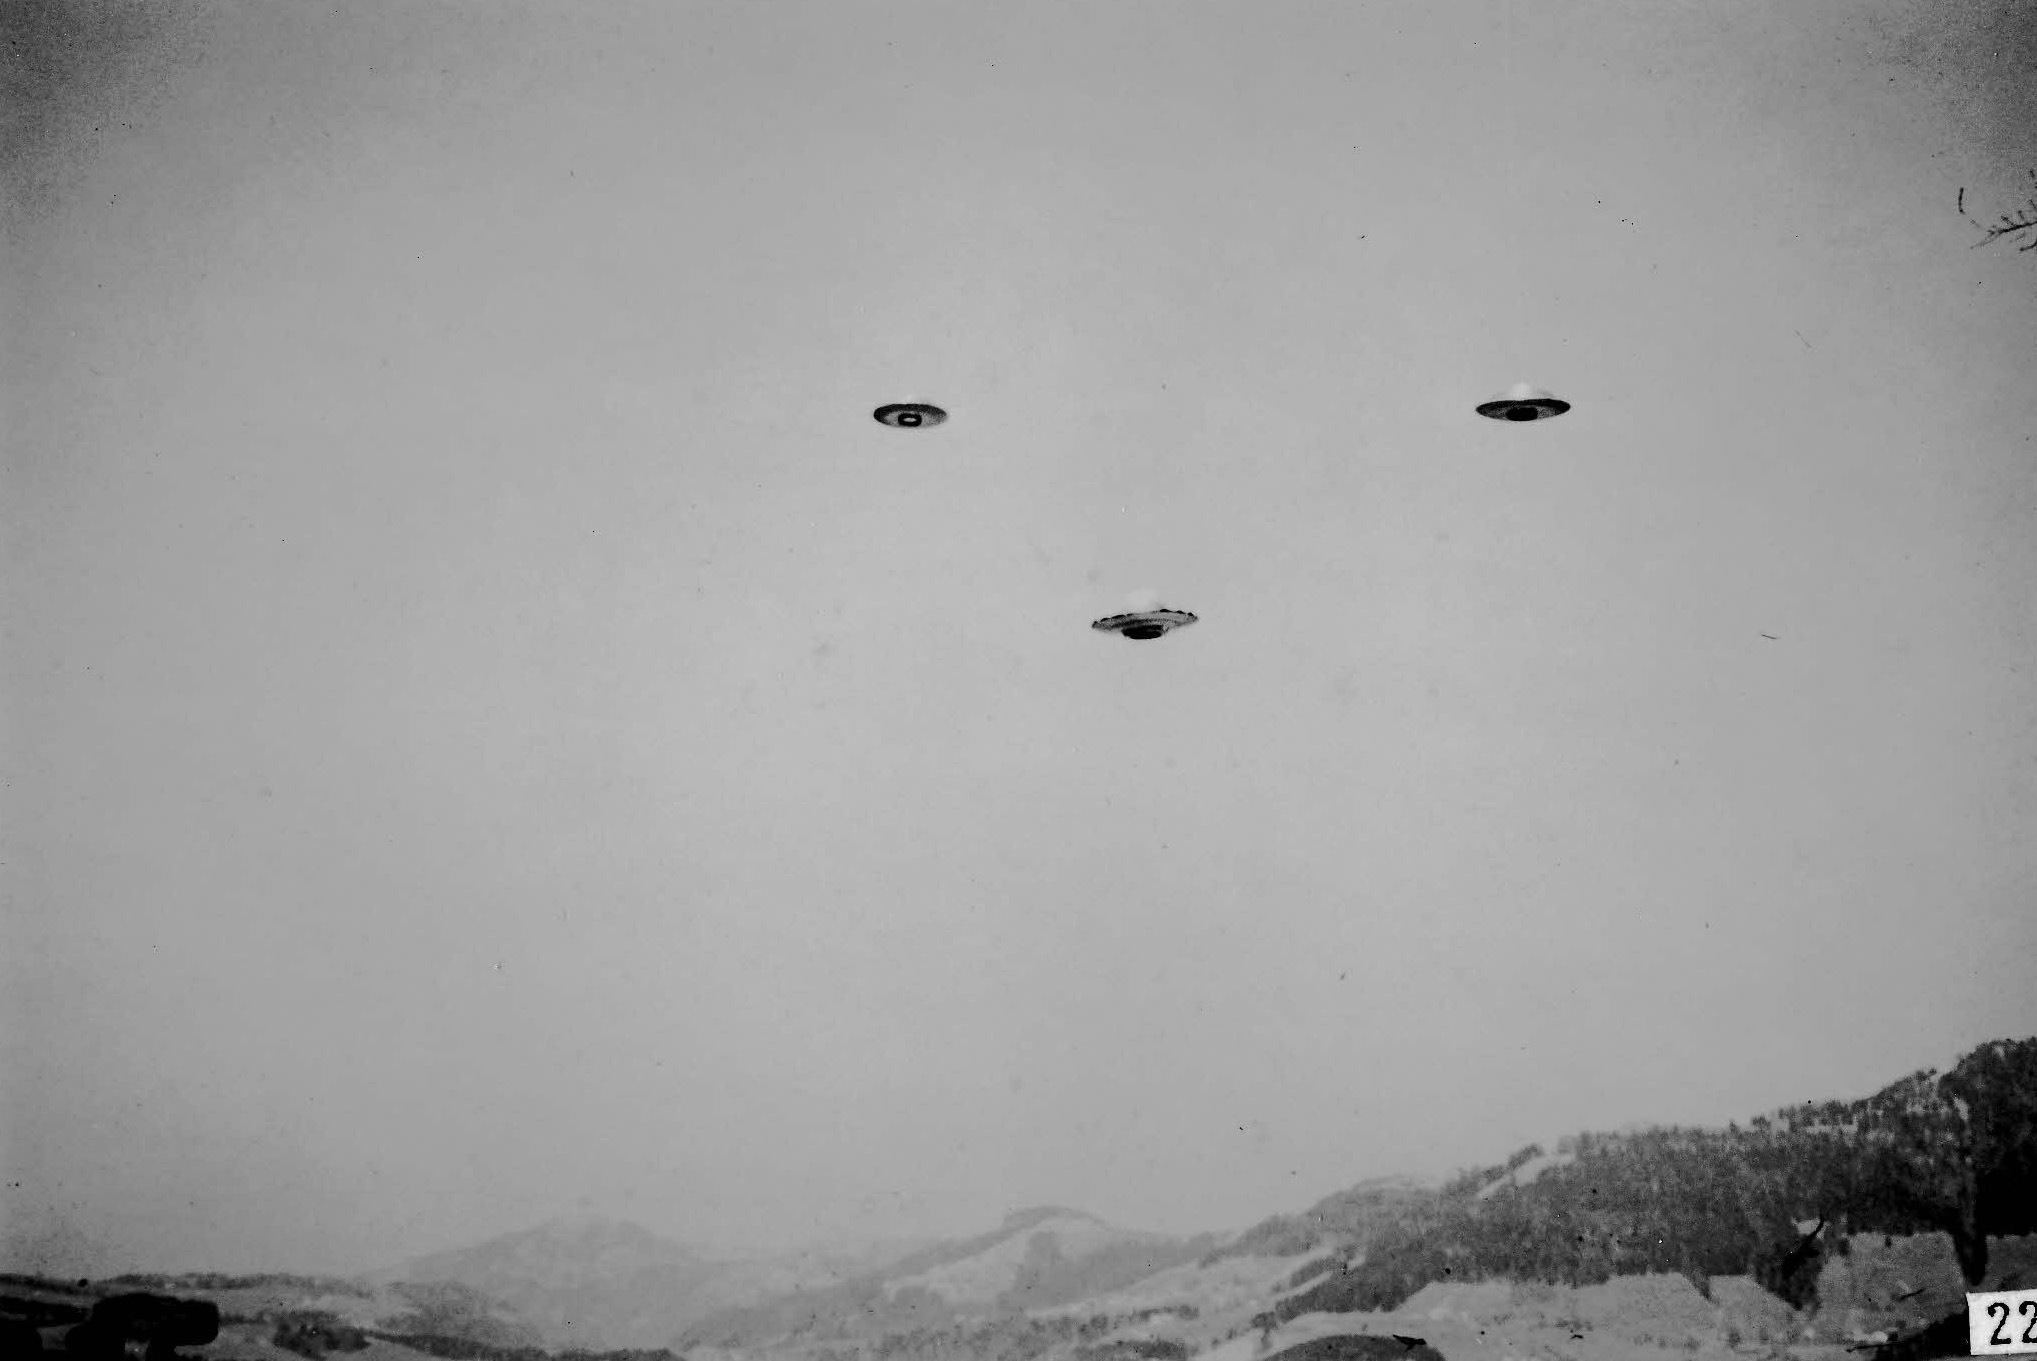 ufo4-2.jpg